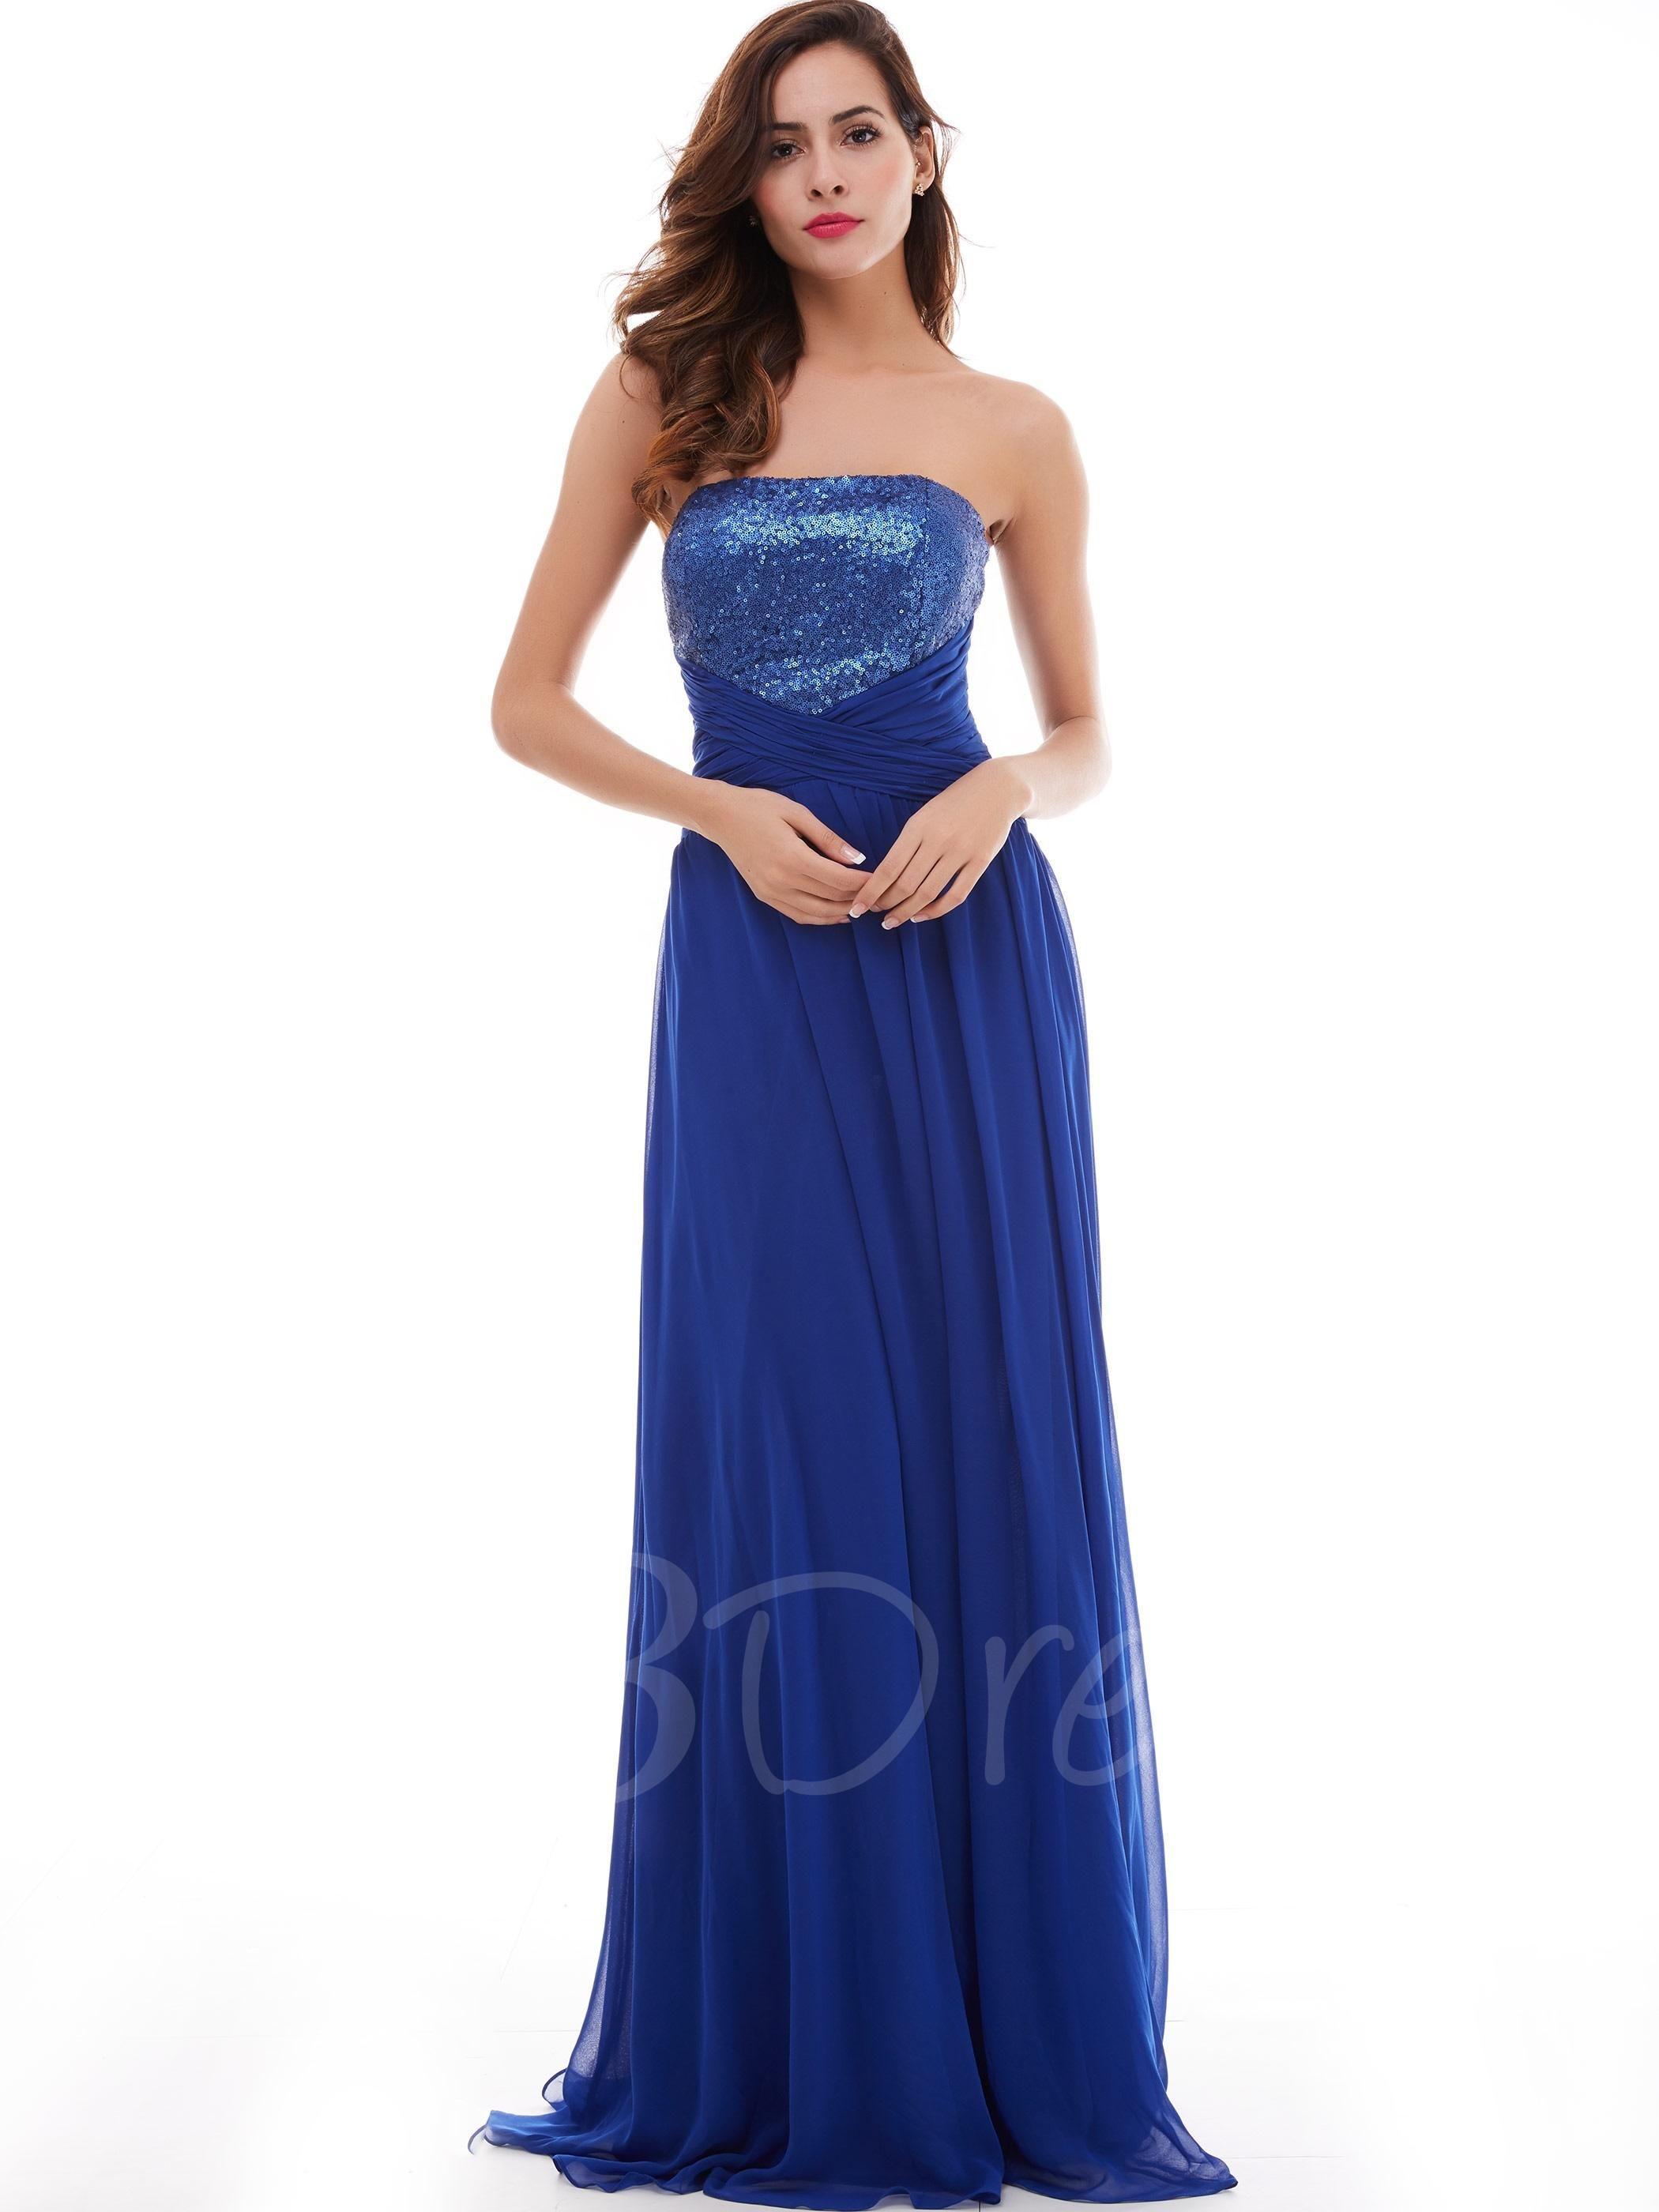 Tbdress tbdress aline strapless draped pleats sequins long prom